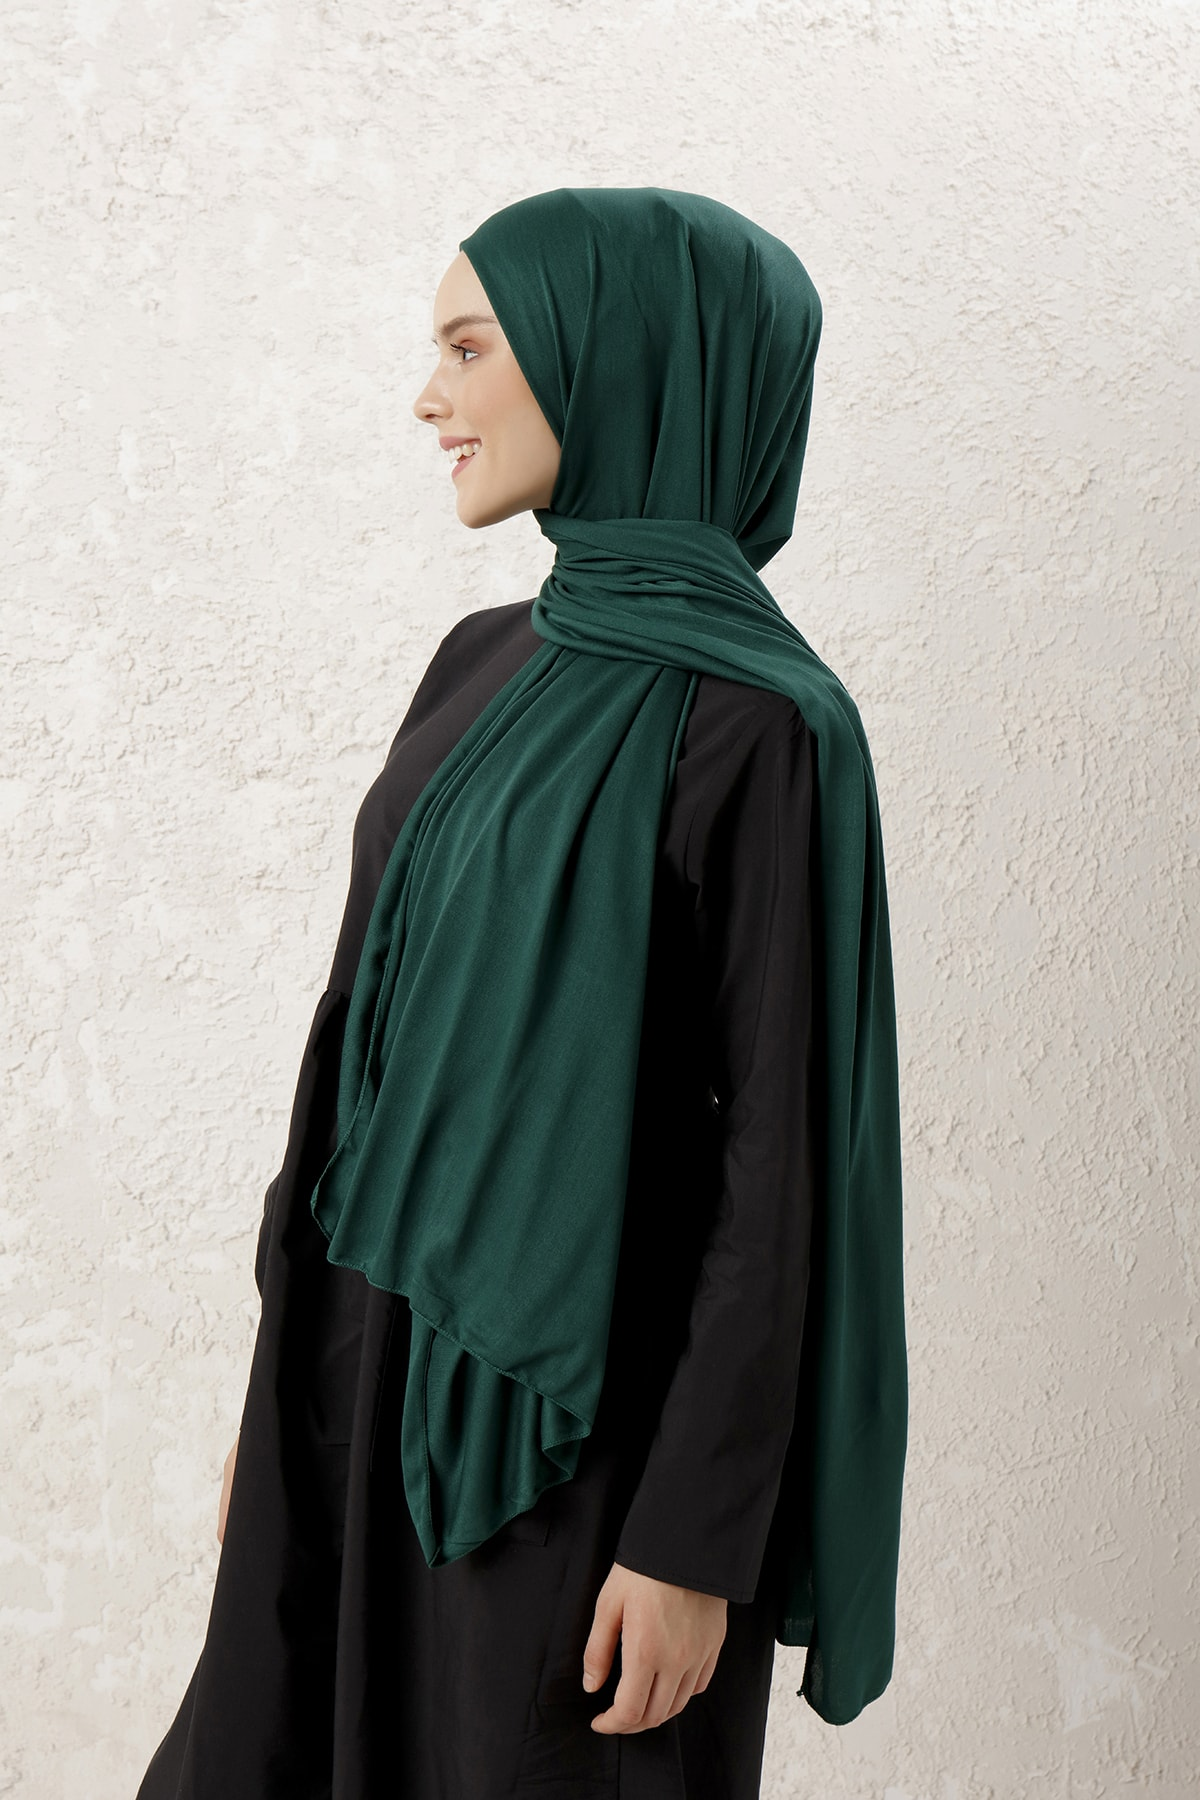 MUJERSCARFS Kadın Zümrüt Yeşili Penye Şal 2